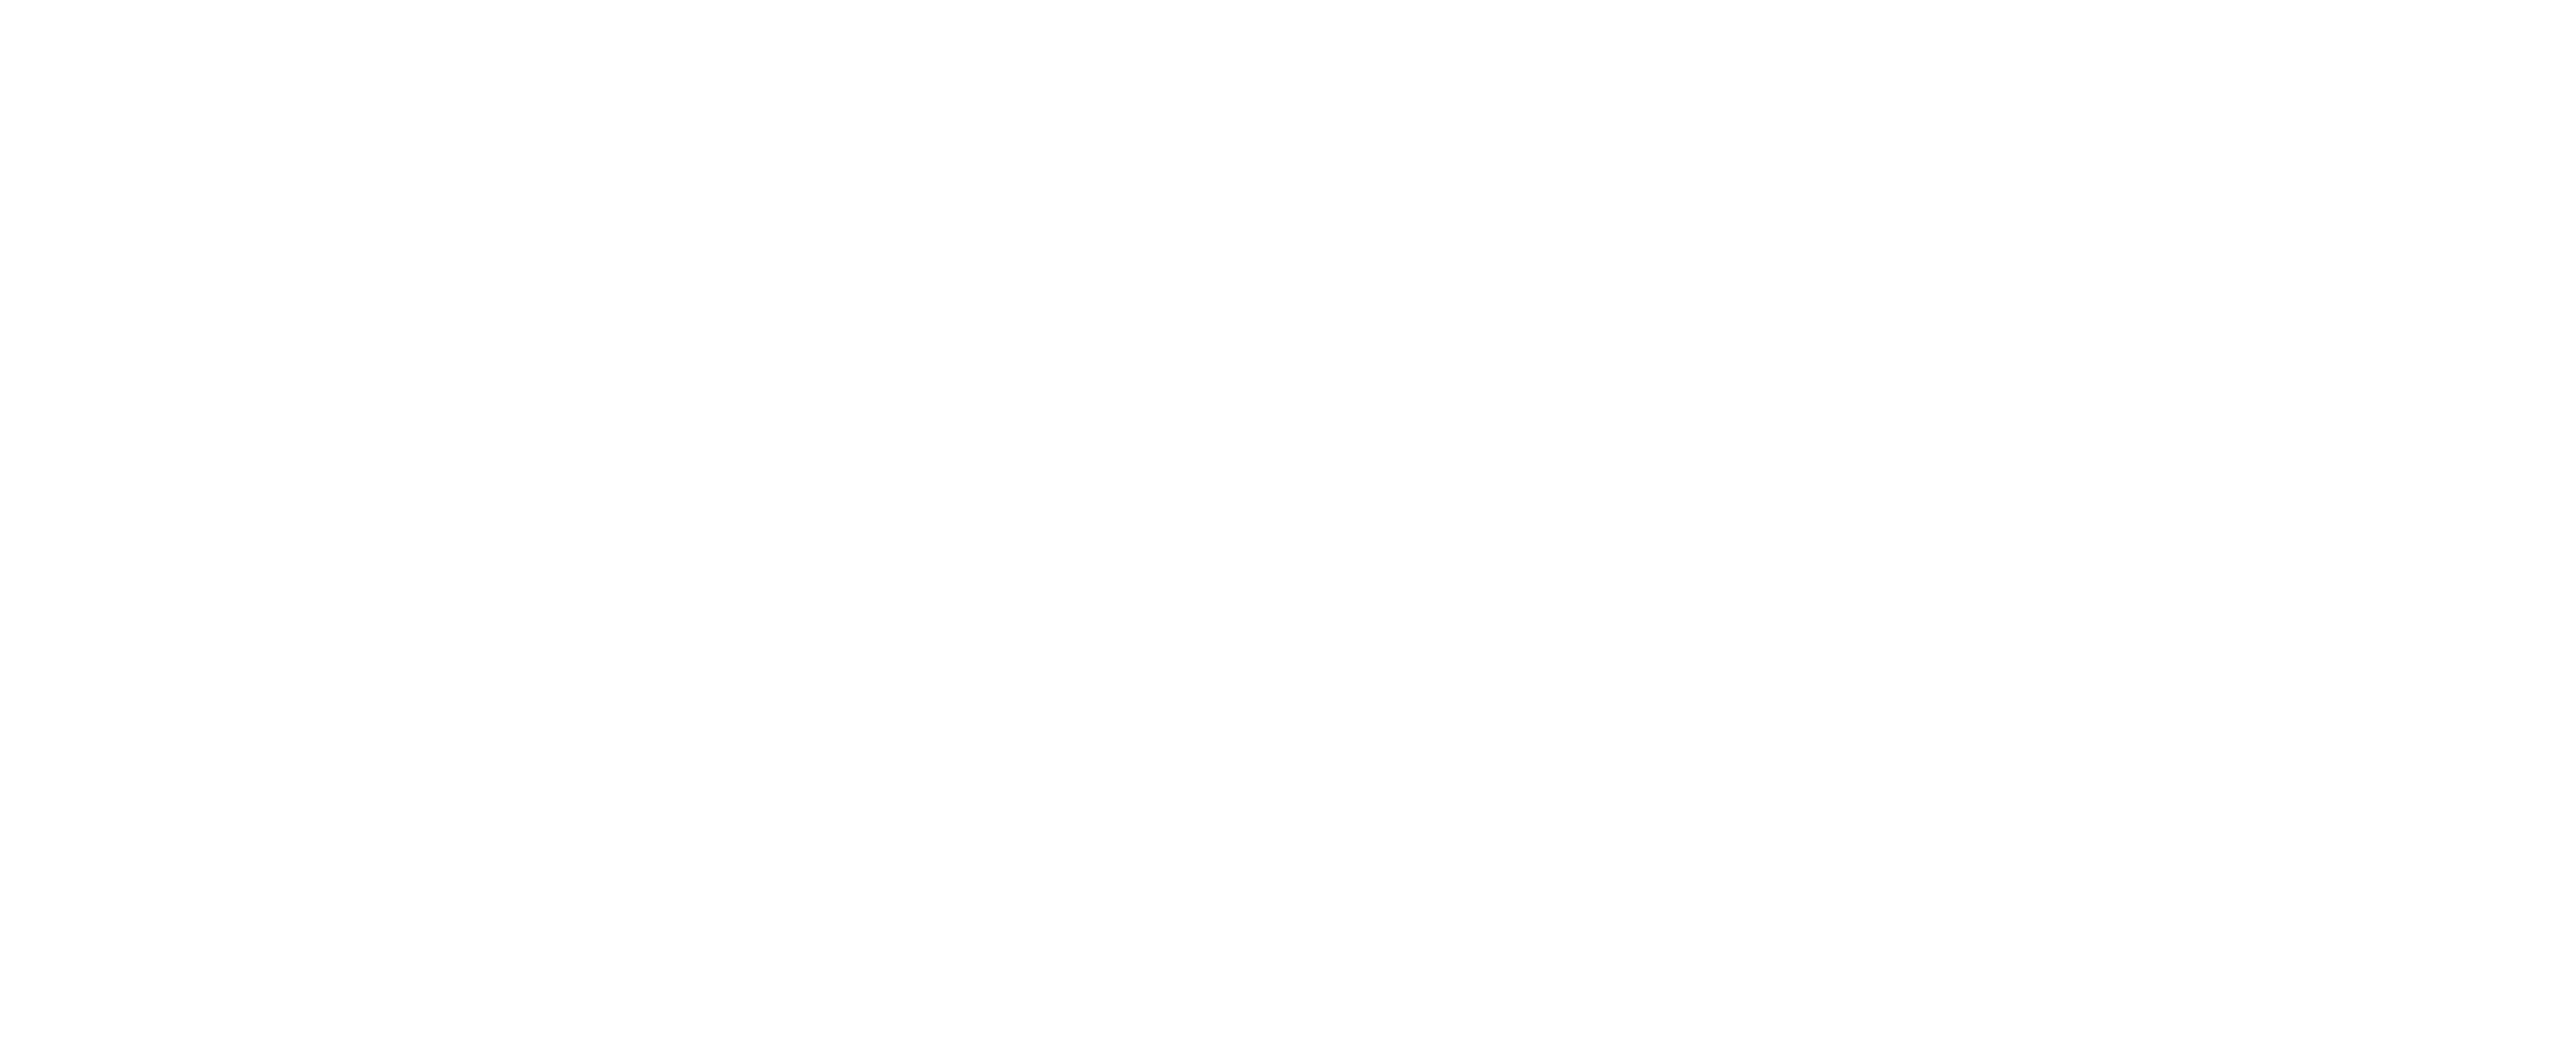 NISHGAKI GUITARS | Official Web Site